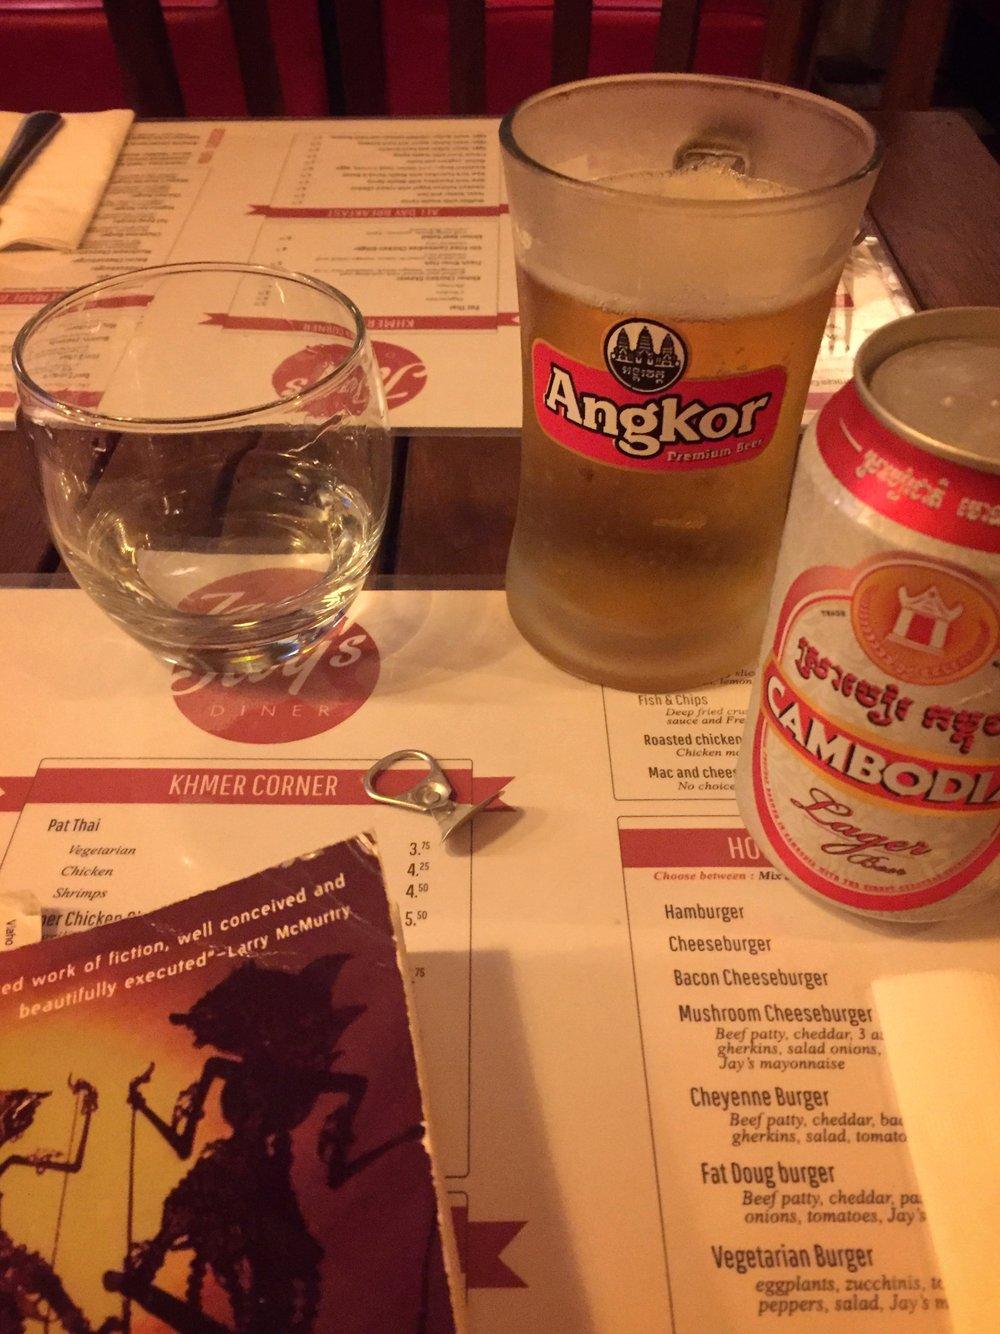 loving Cambodia's pull-tab beer